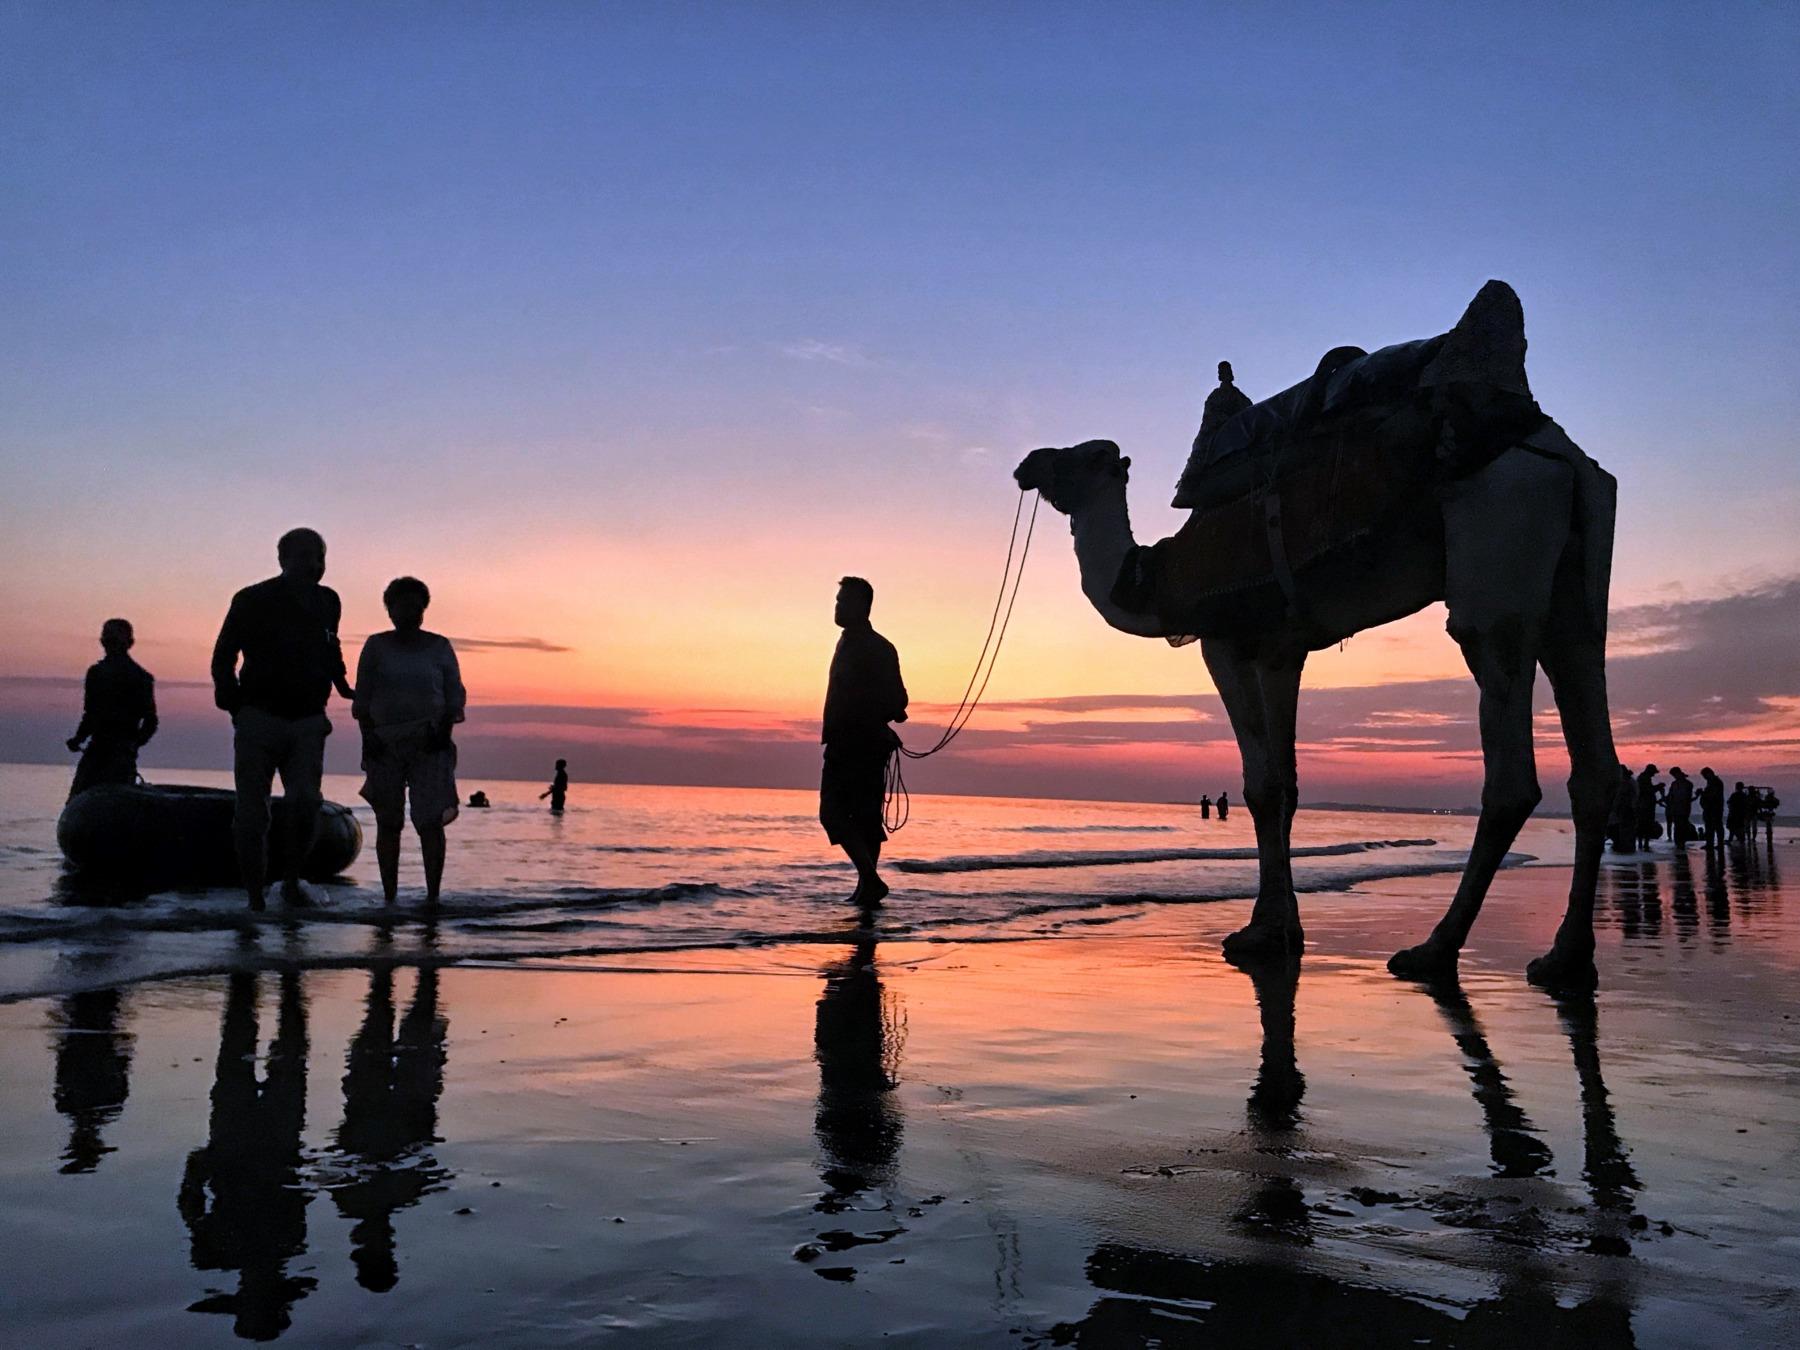 Mandi beach, a tourism spot in Kachchh